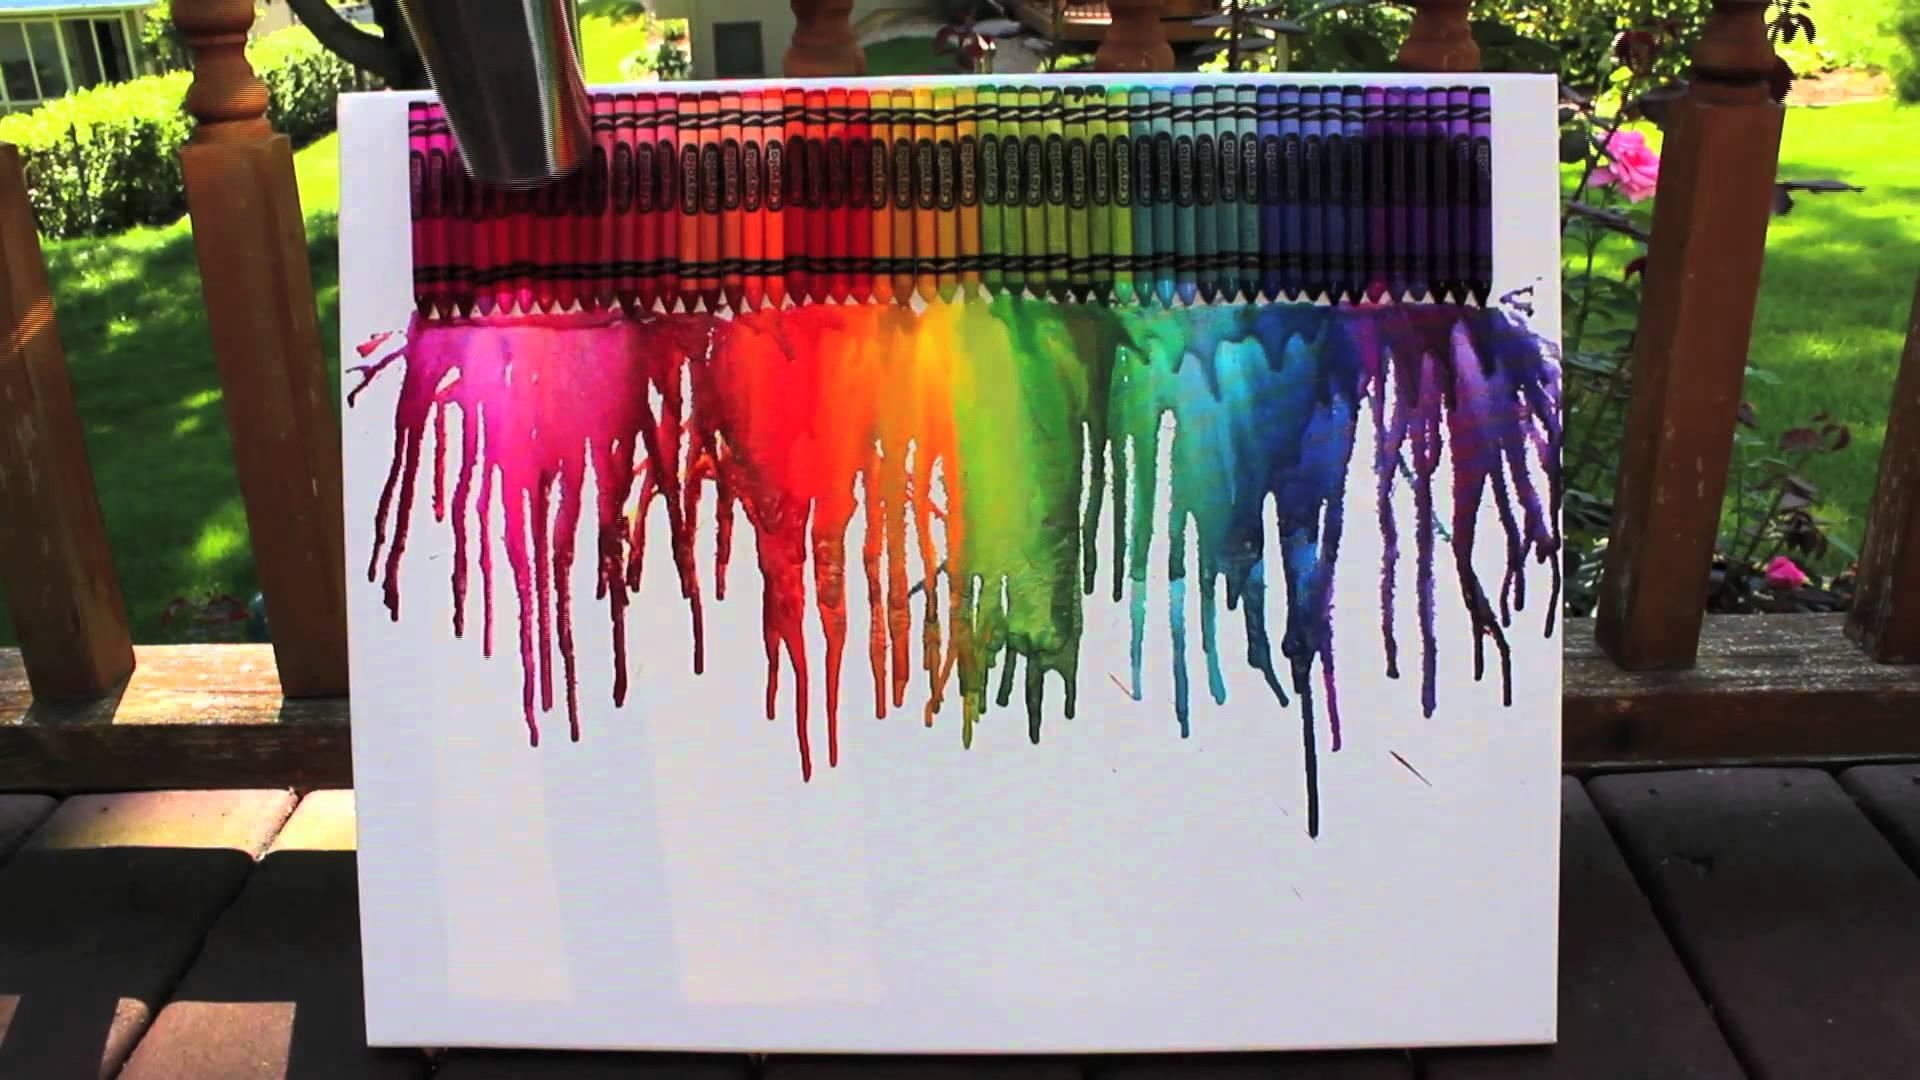 Crayon Melting amp Splatter Paint Qtinycom